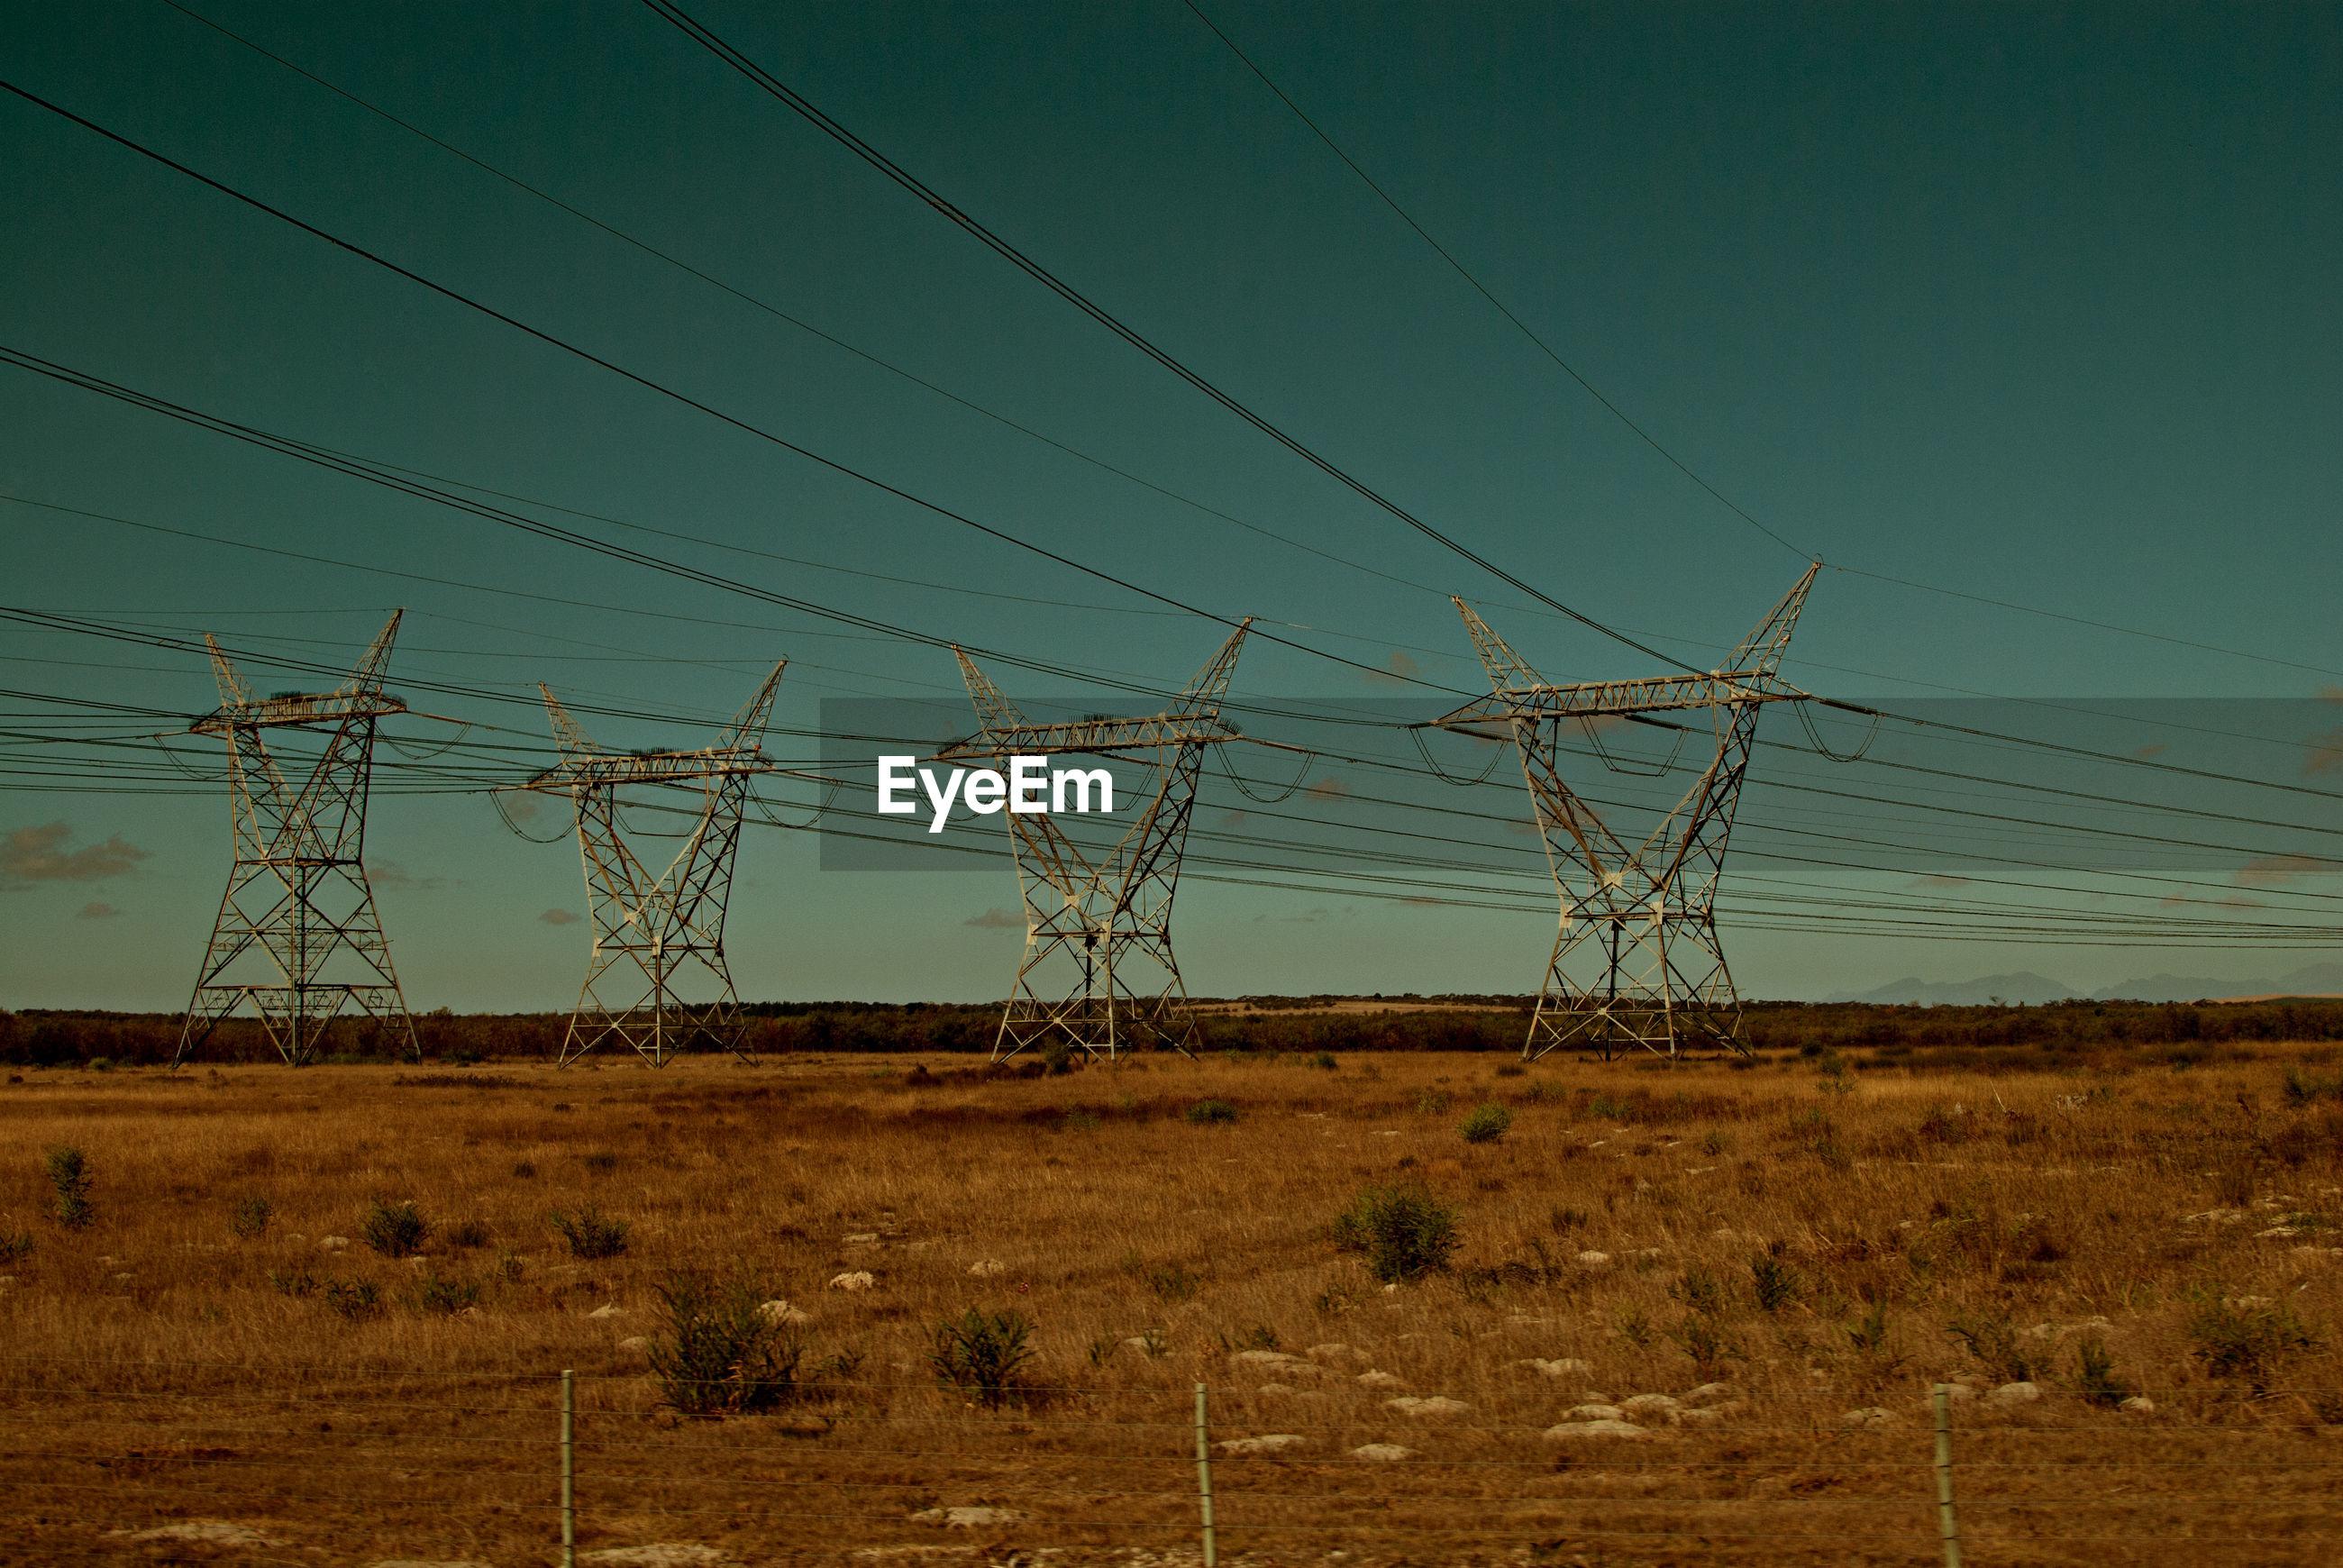 Electricity pylon on field against blue sky